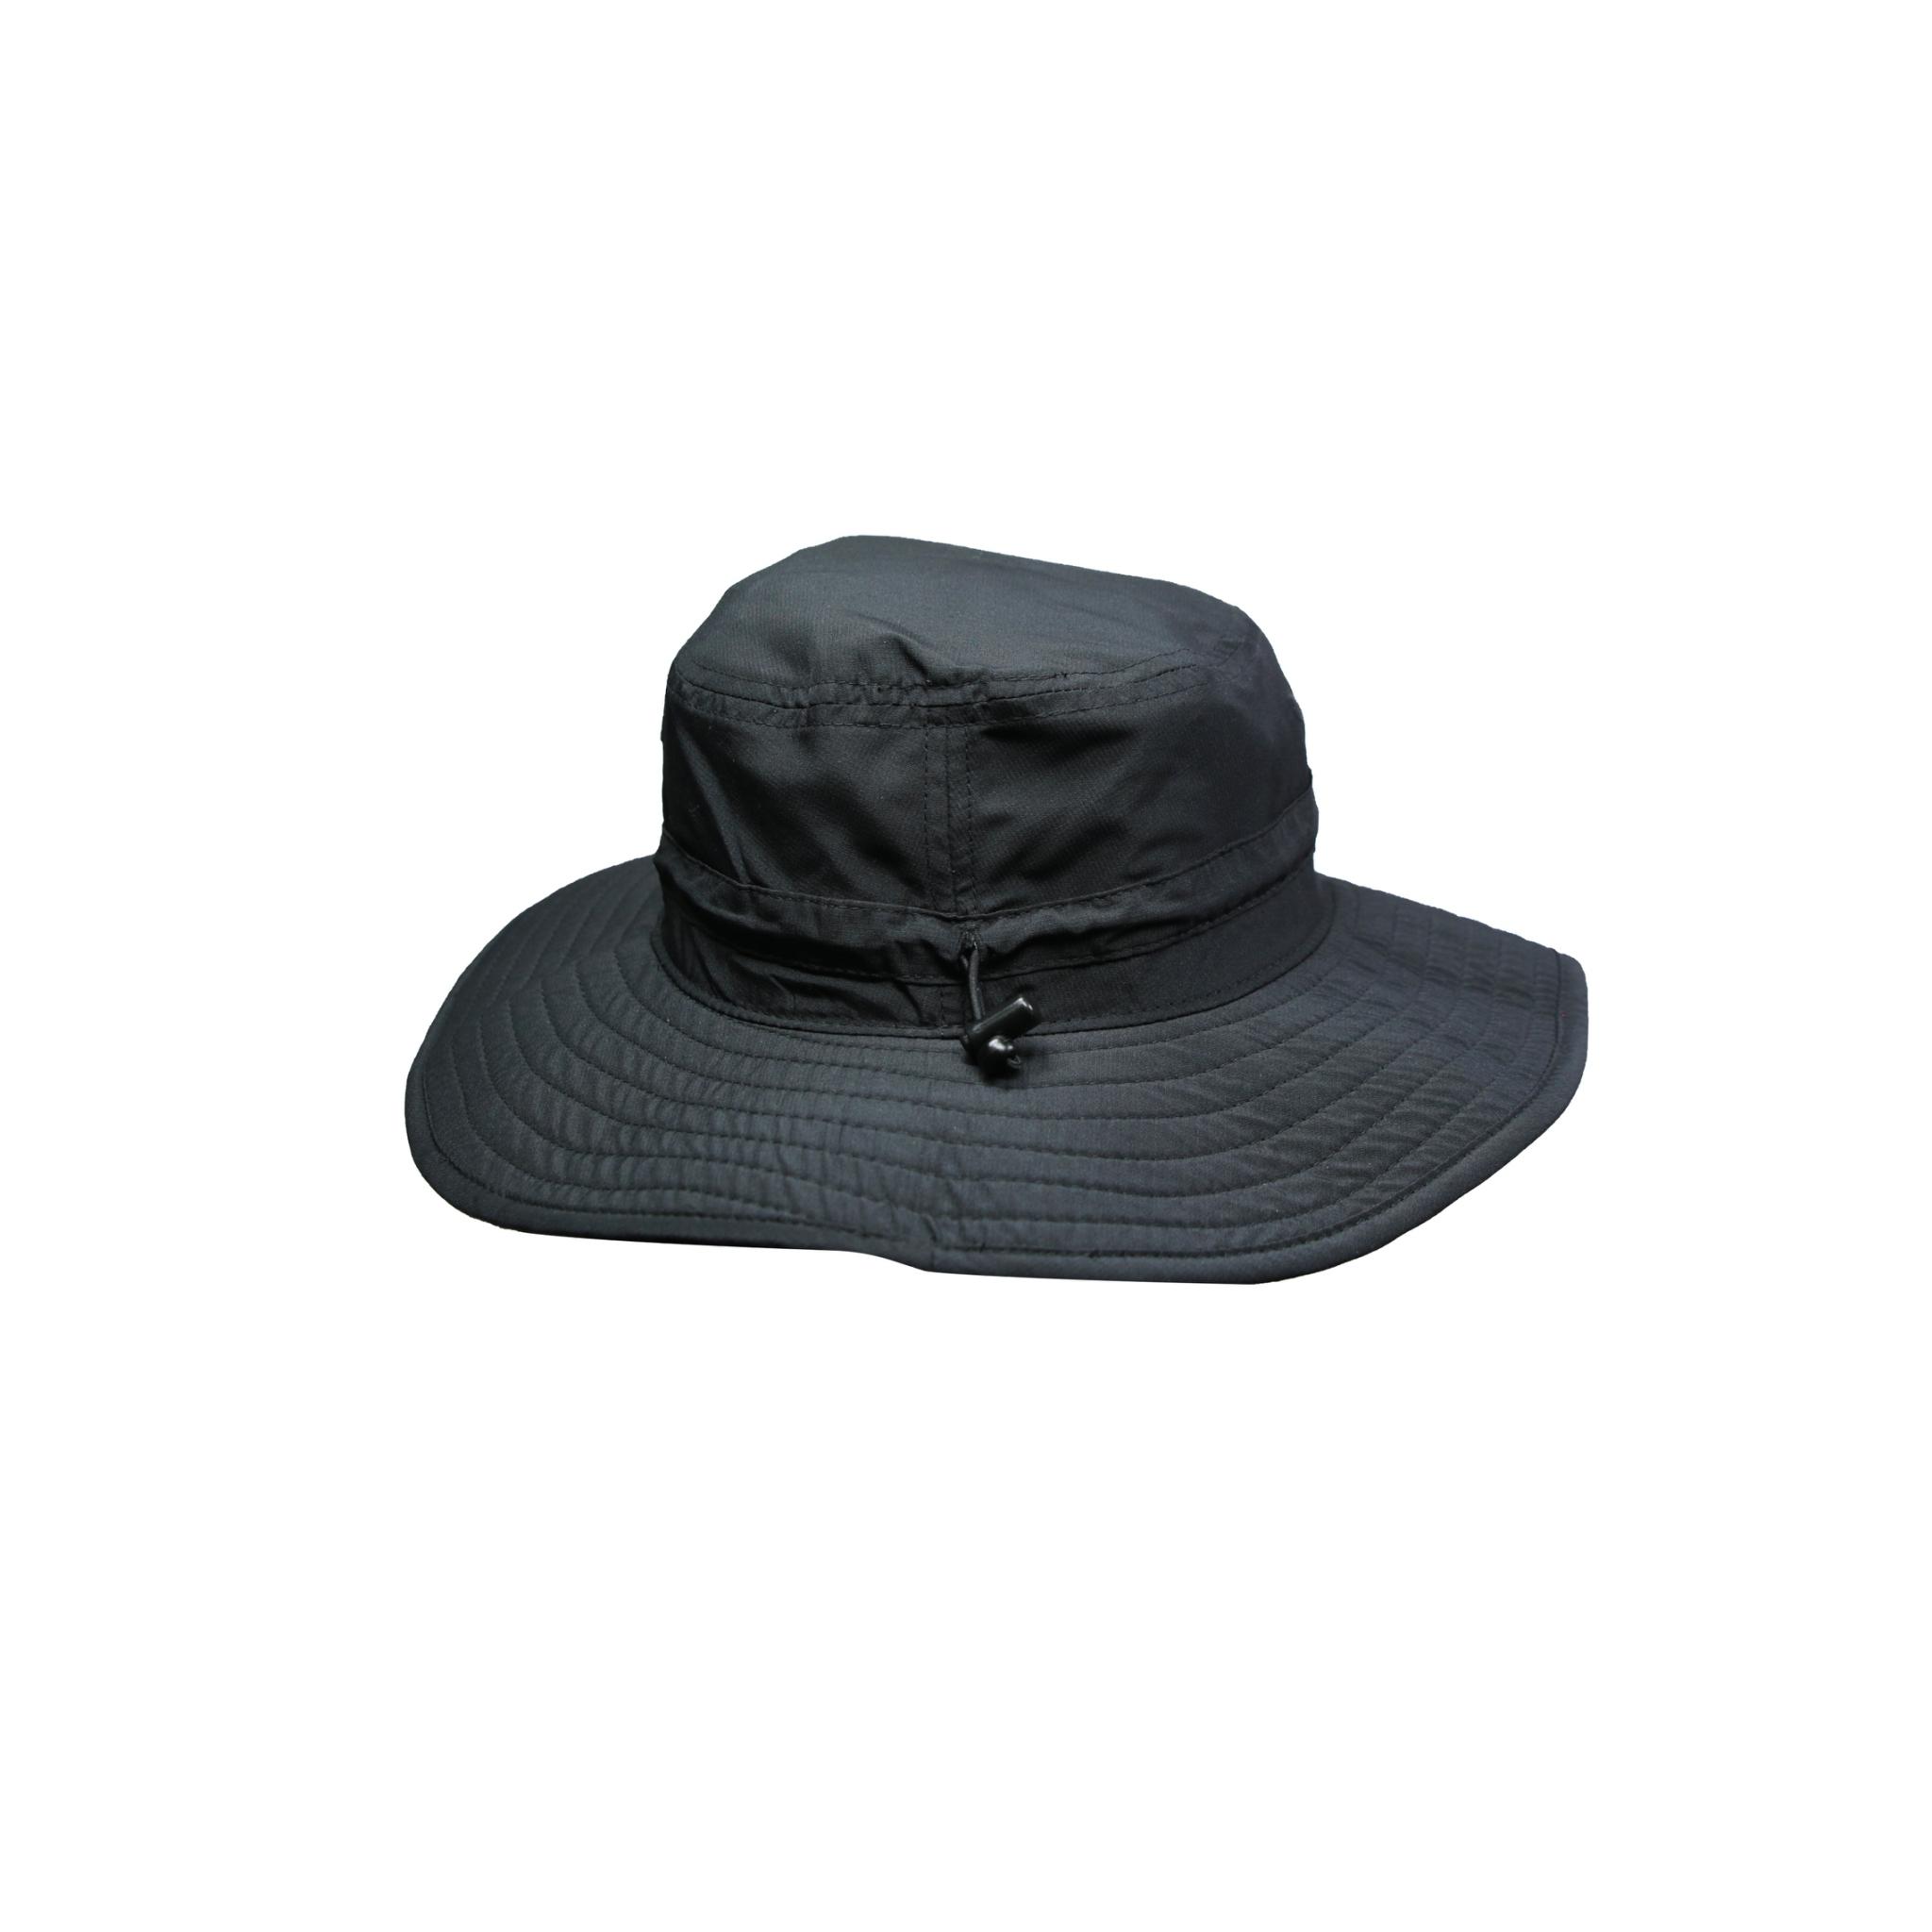 LOGO CAMP BOONEY [BLACK]